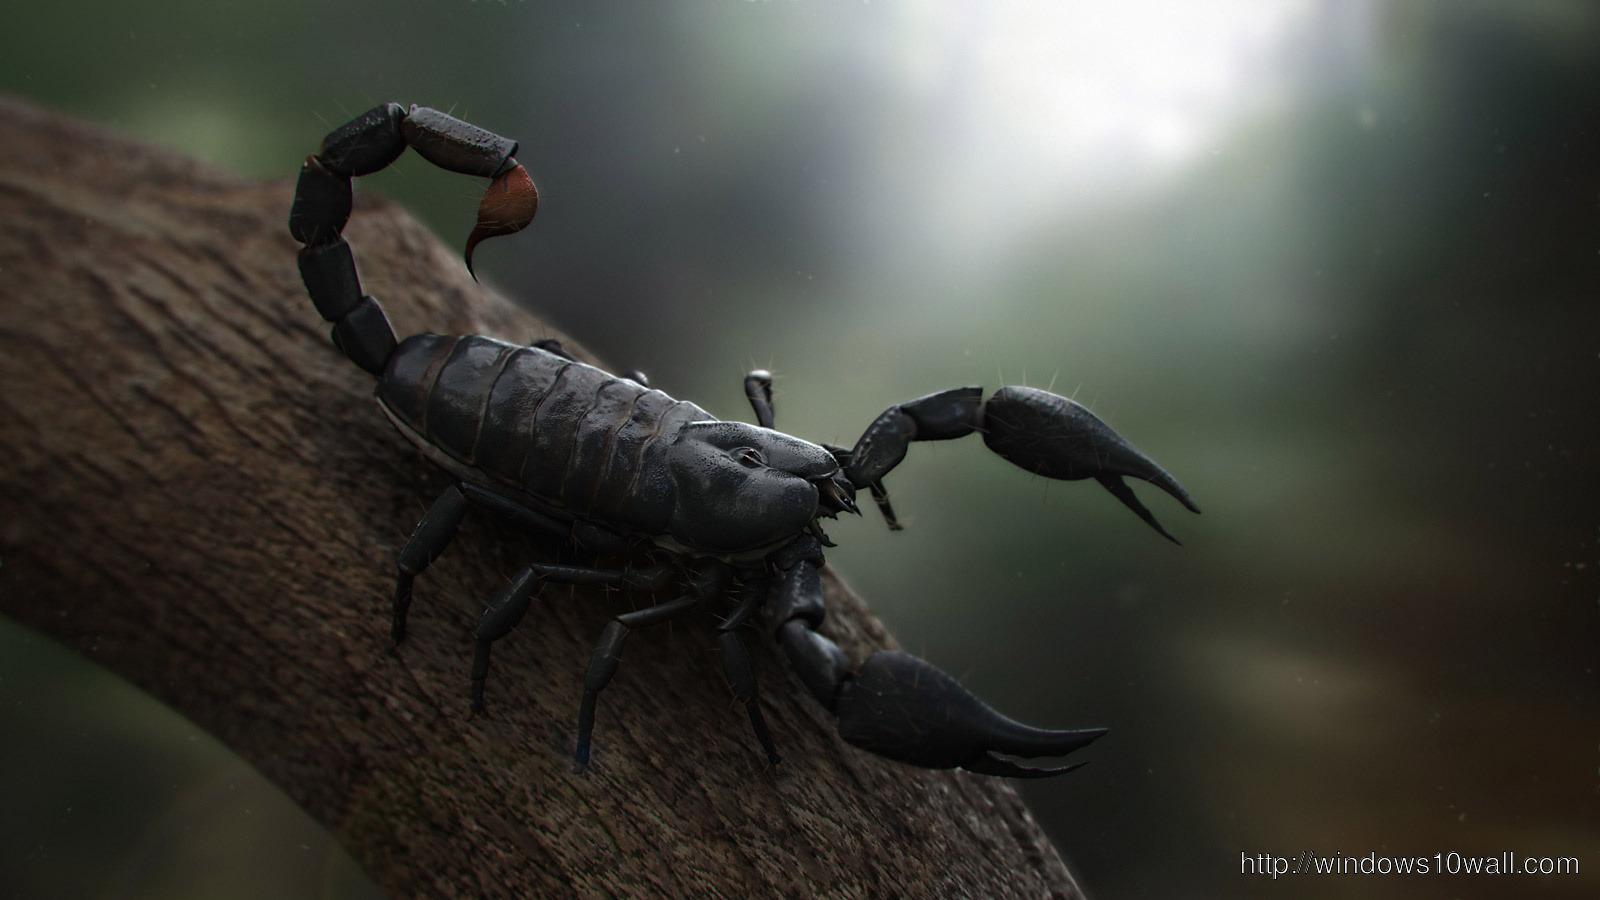 Naruto Quotes Wallpaper Hd Black Scorpion Hd Desktop Widescreen Download Now